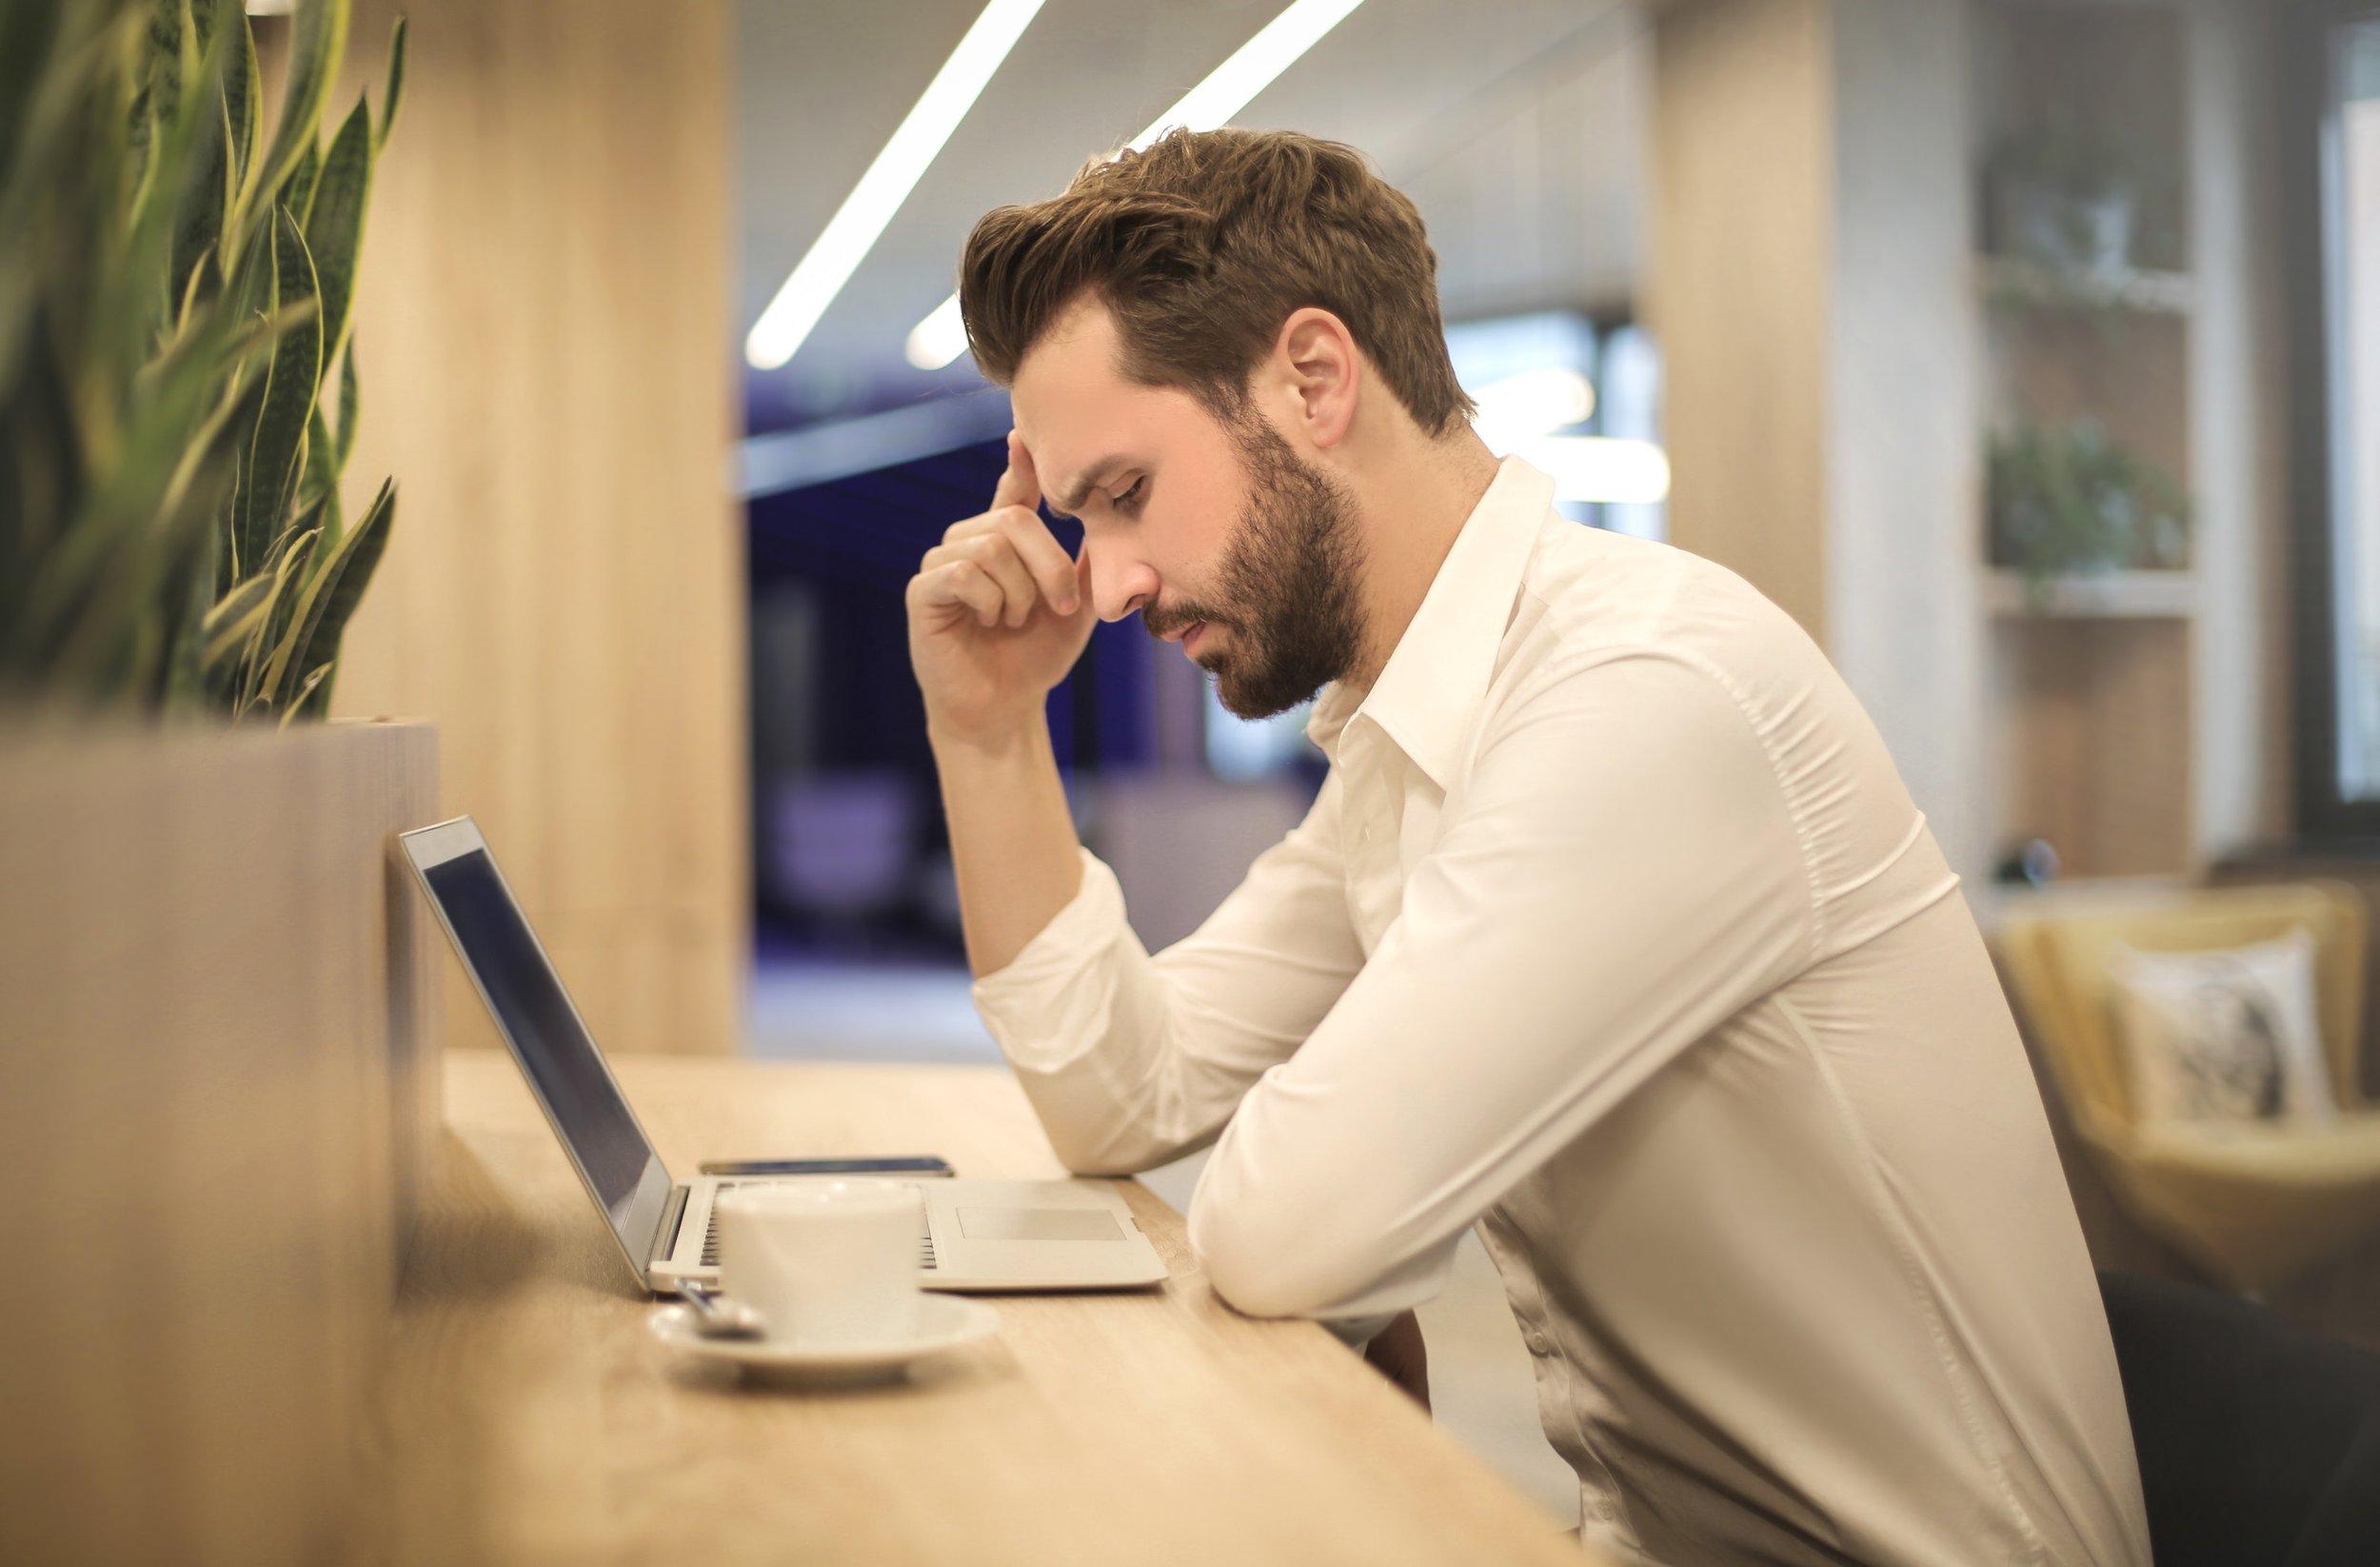 Nashville-IT-Support-Managed-Services-Affinity-Technology-Partners-Concerned-Computer-User.jpg